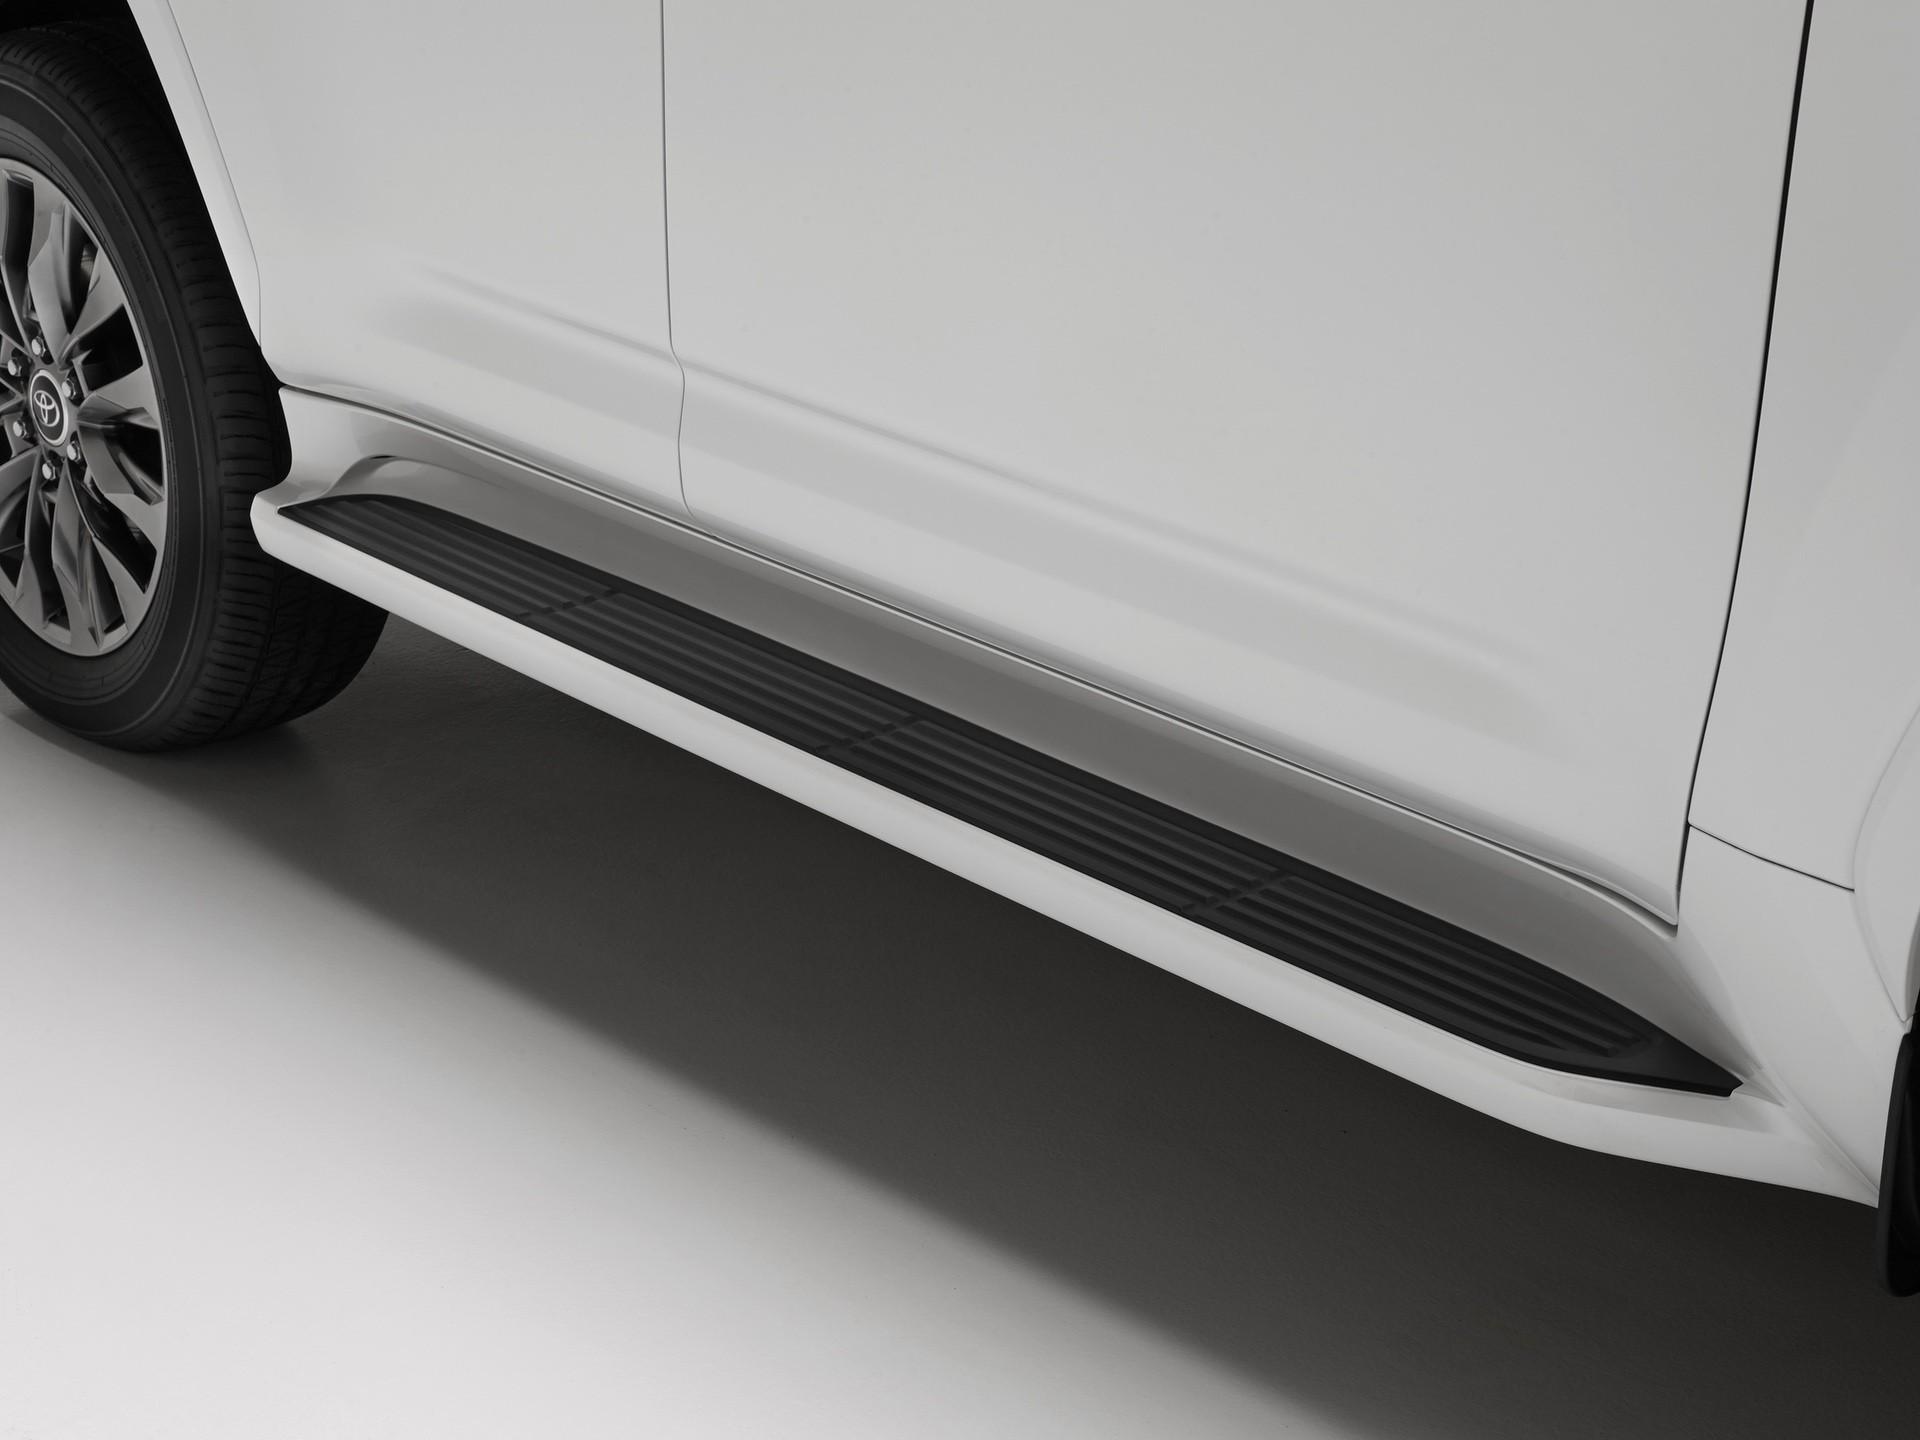 2021_Toyota_Land_Cruiser-0015